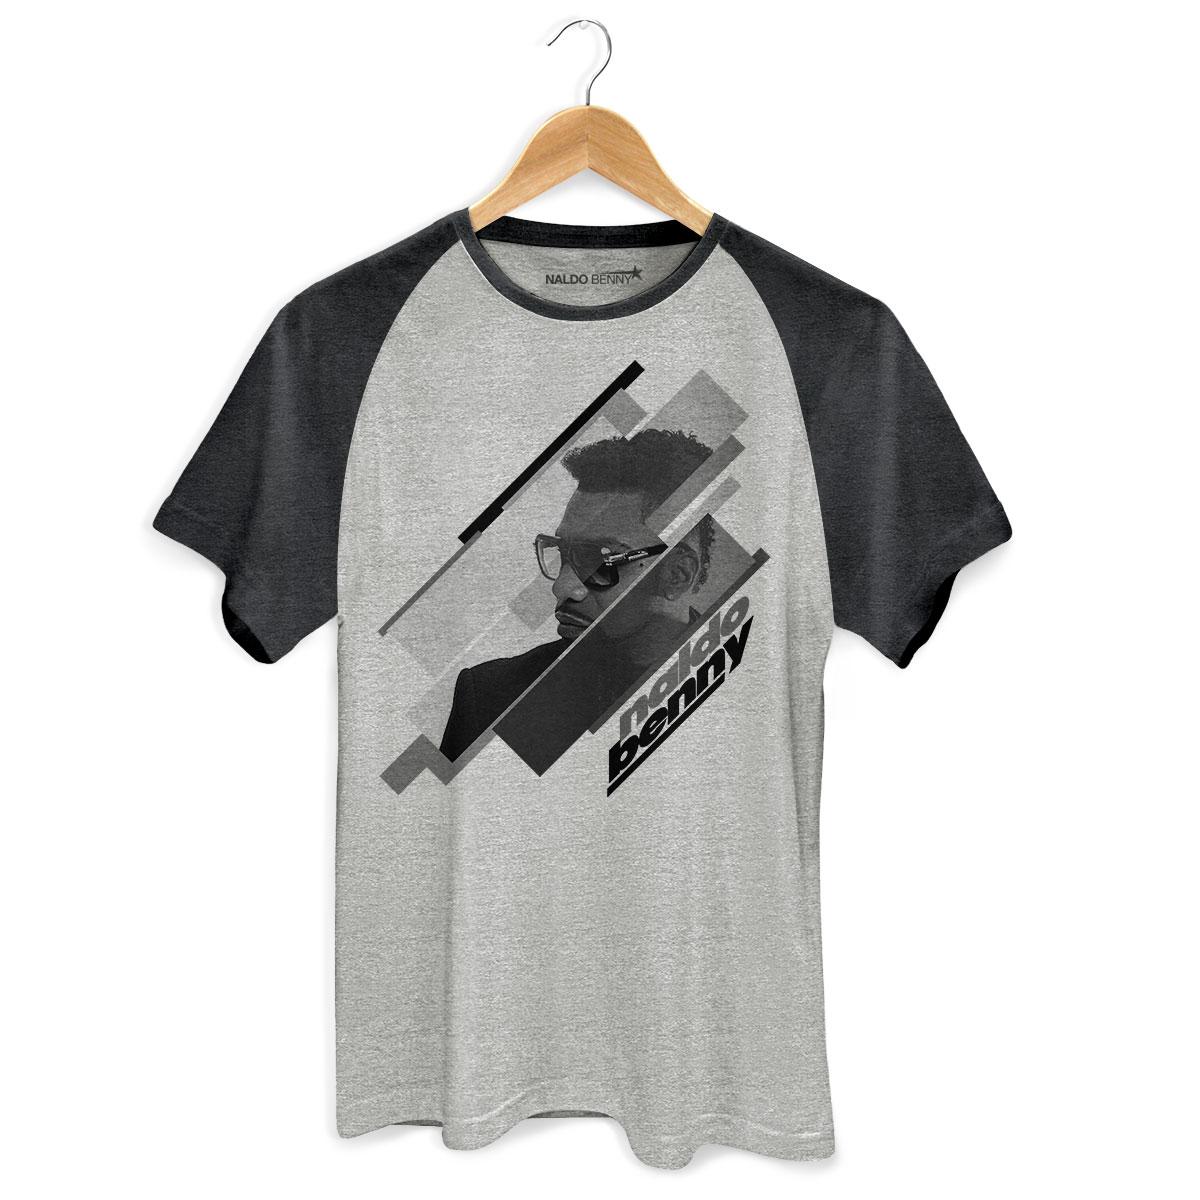 Camiseta Raglan Premium Masculina Naldo Benny Perfil PB